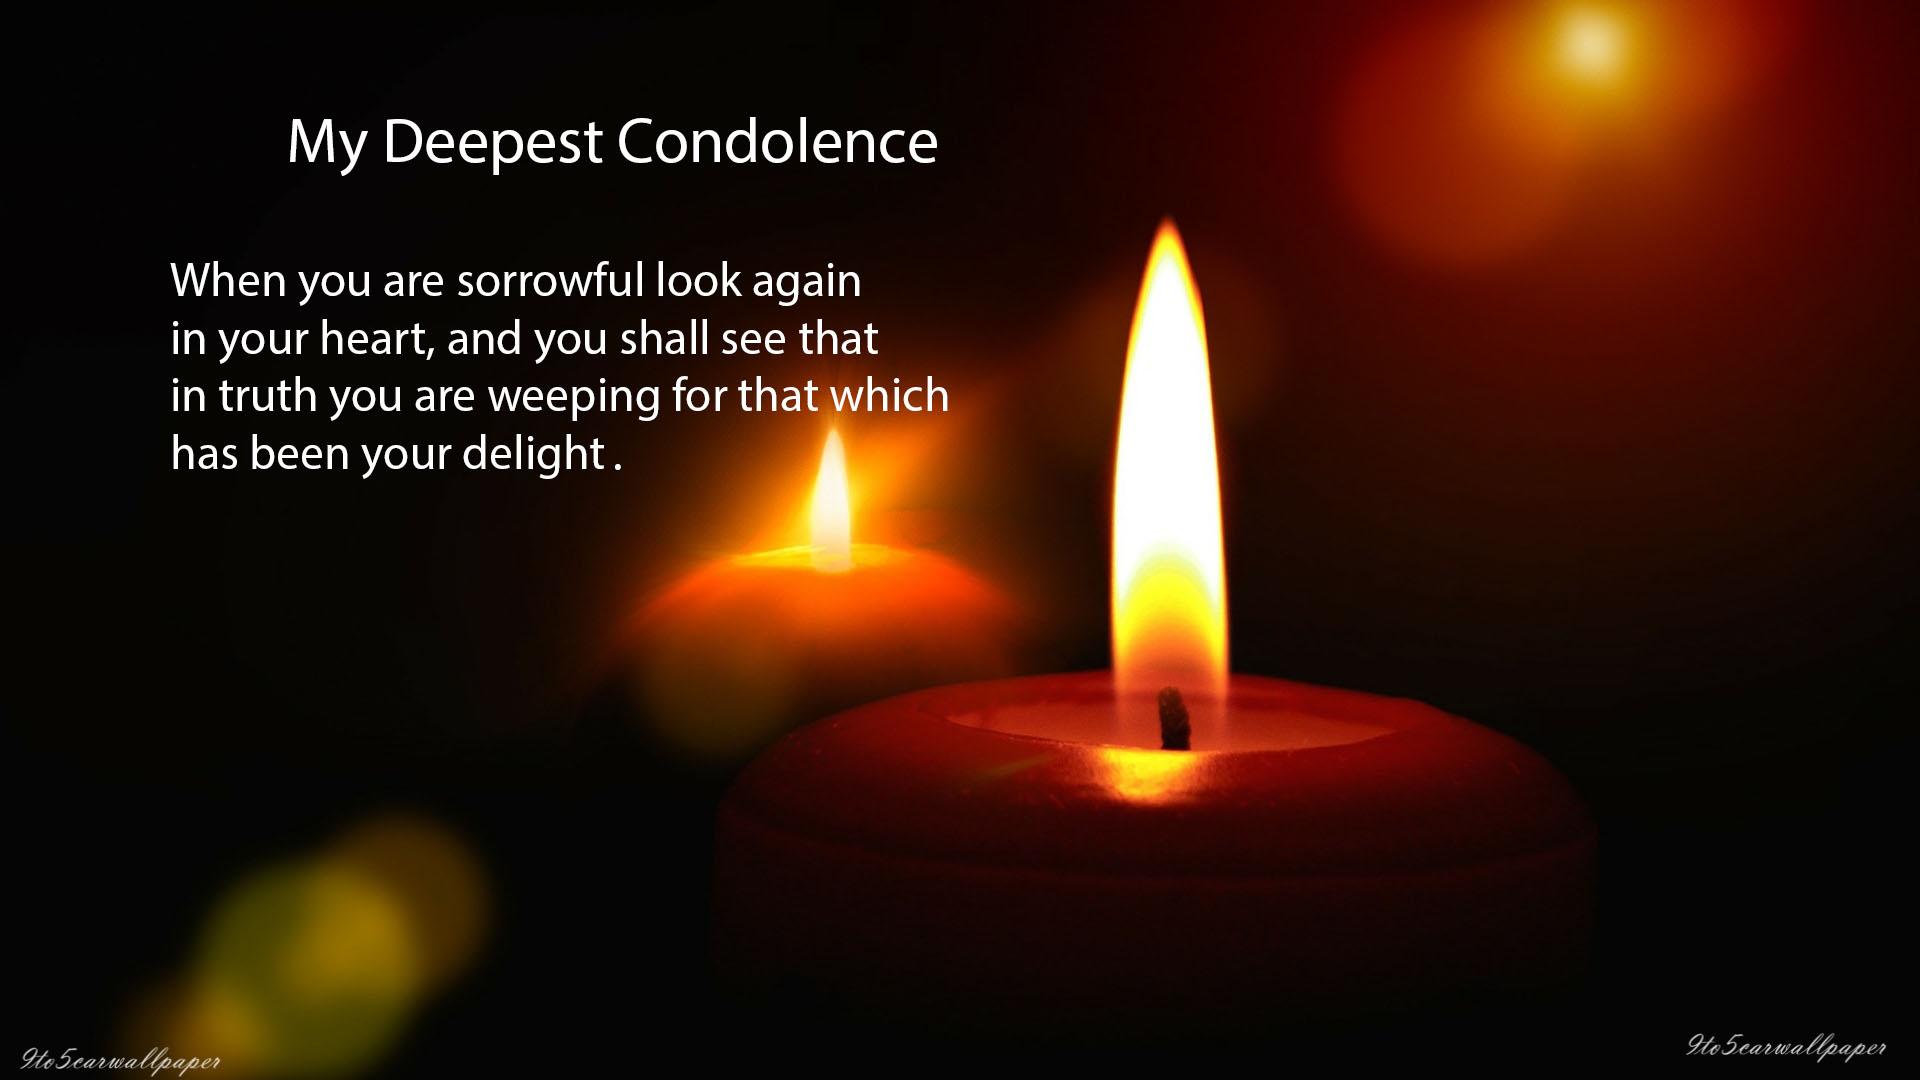 Condolence quote sympathy quotes 3 wallpaper and images collection condolence quote sympathy quotes 3 altavistaventures Choice Image